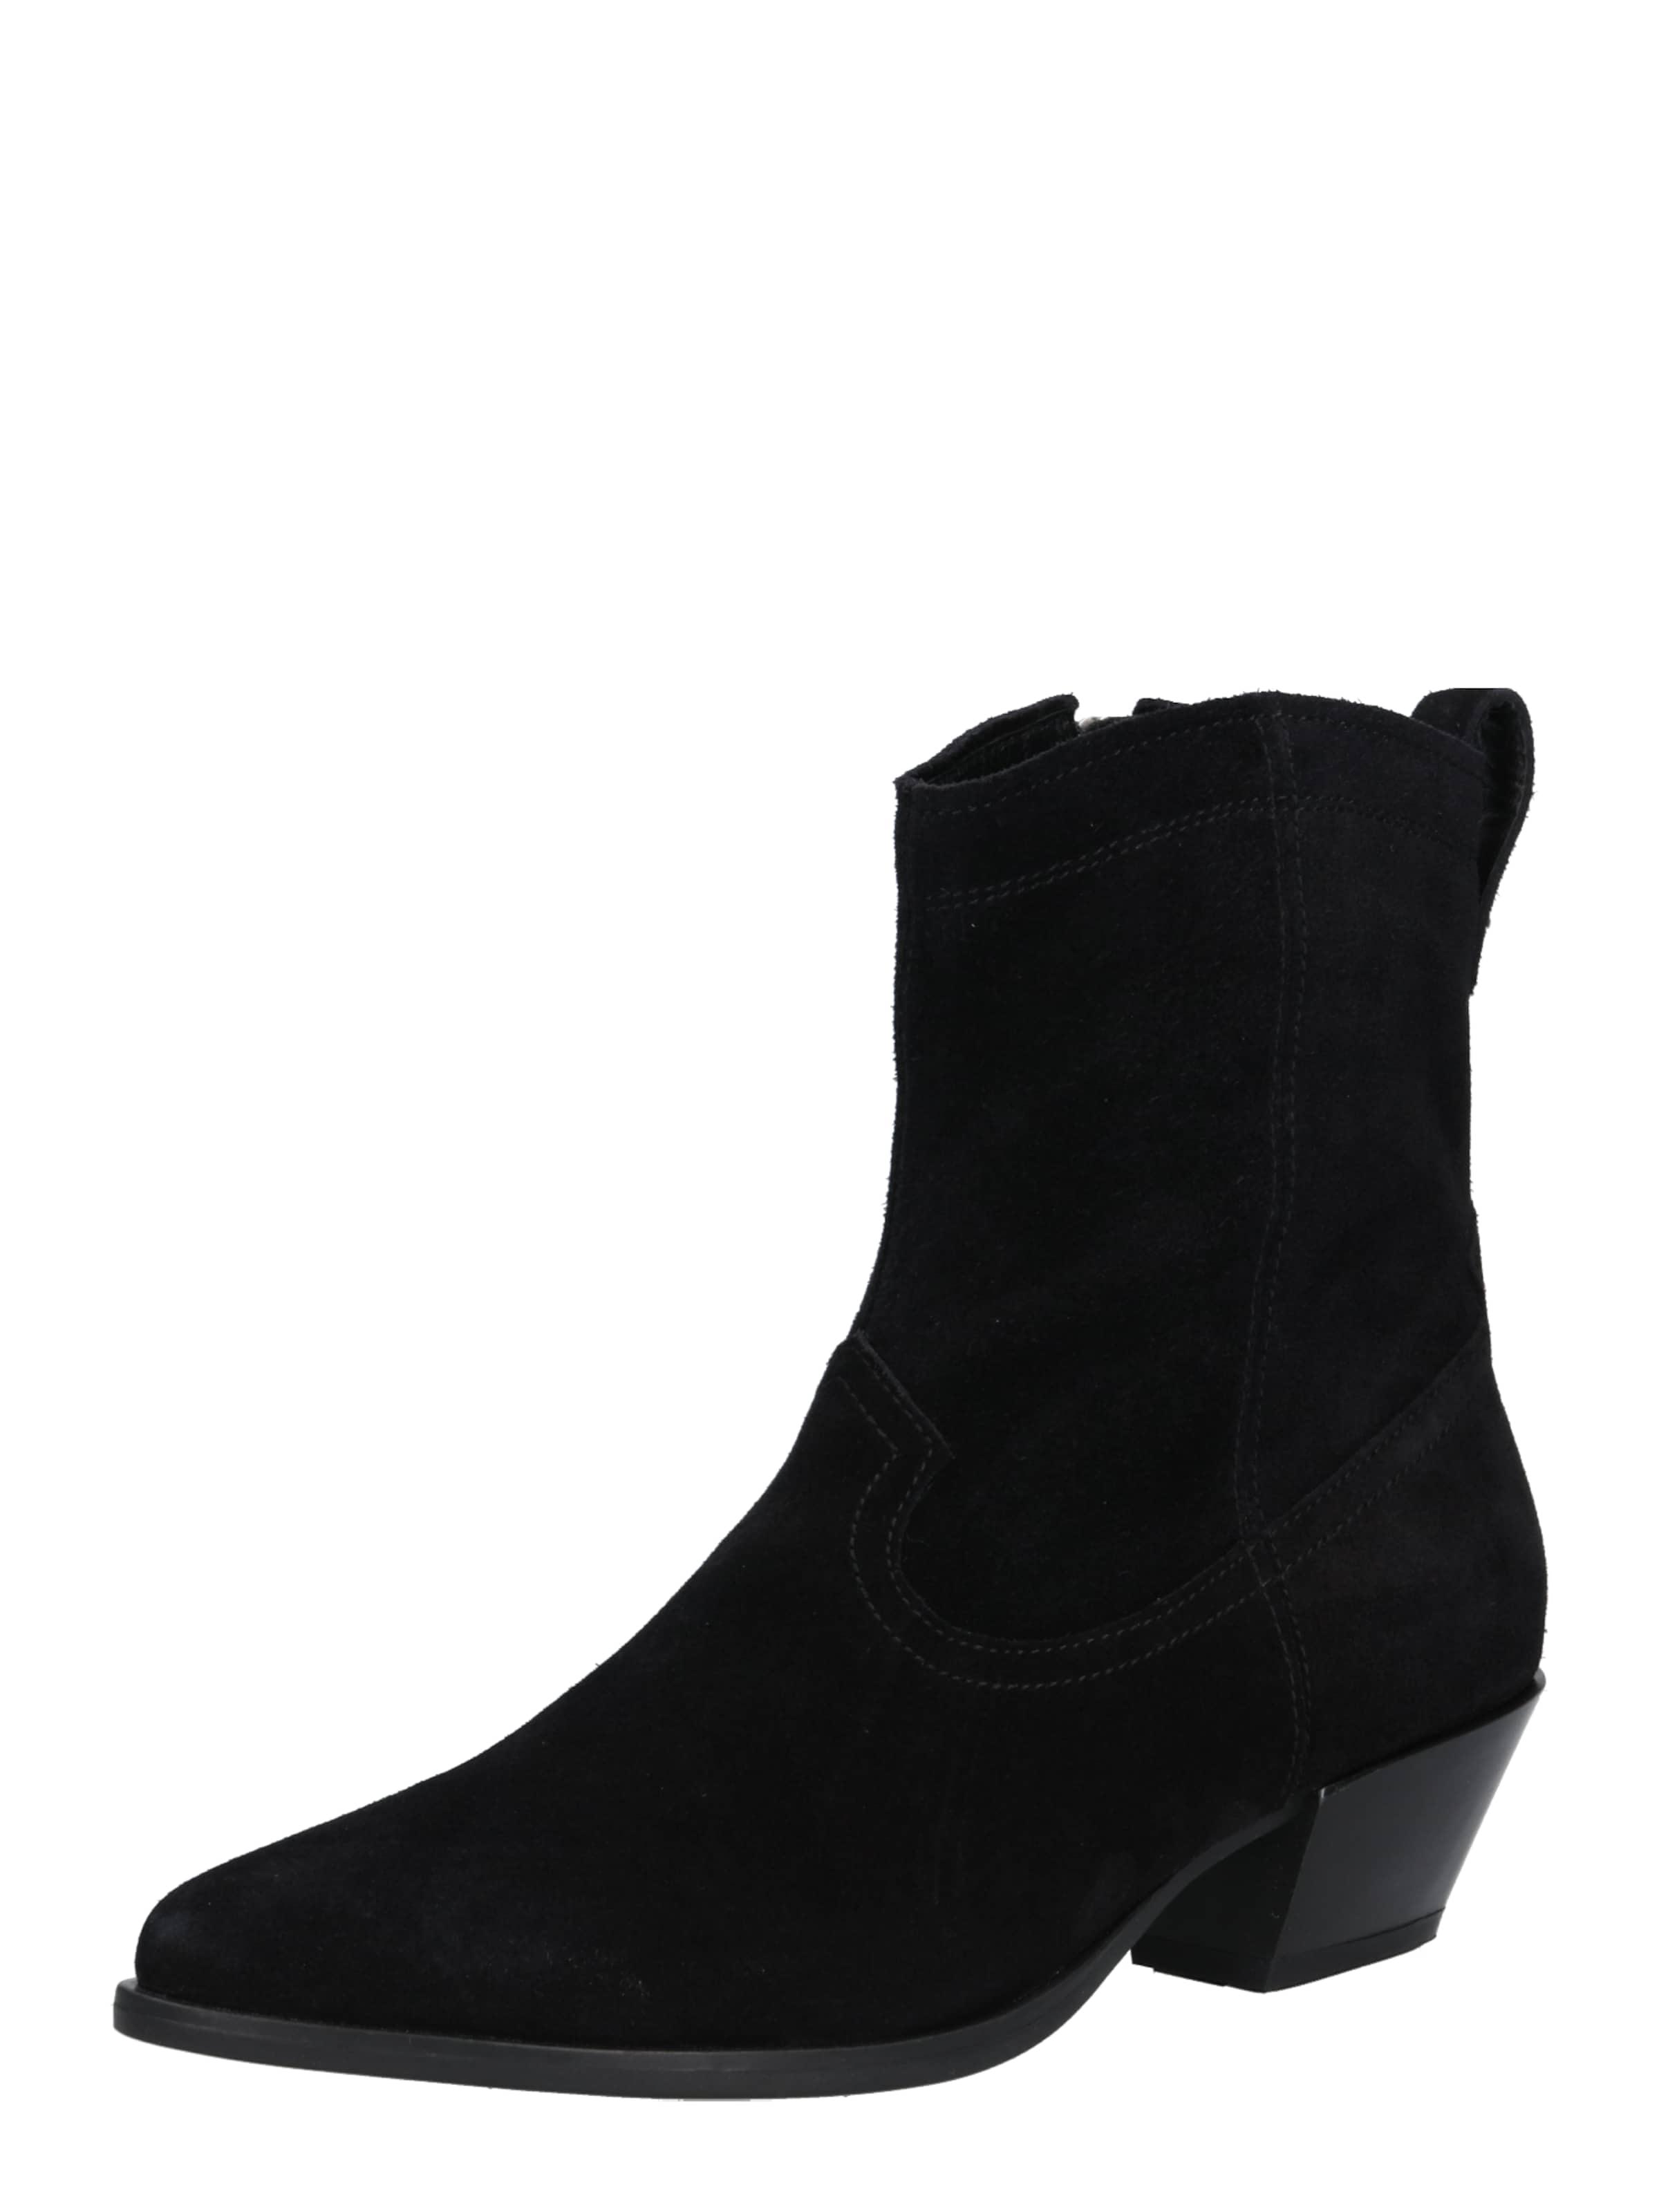 Cowboystiefel Shoemakers Schwarz 'emily' In Vagabond oeCdxBr